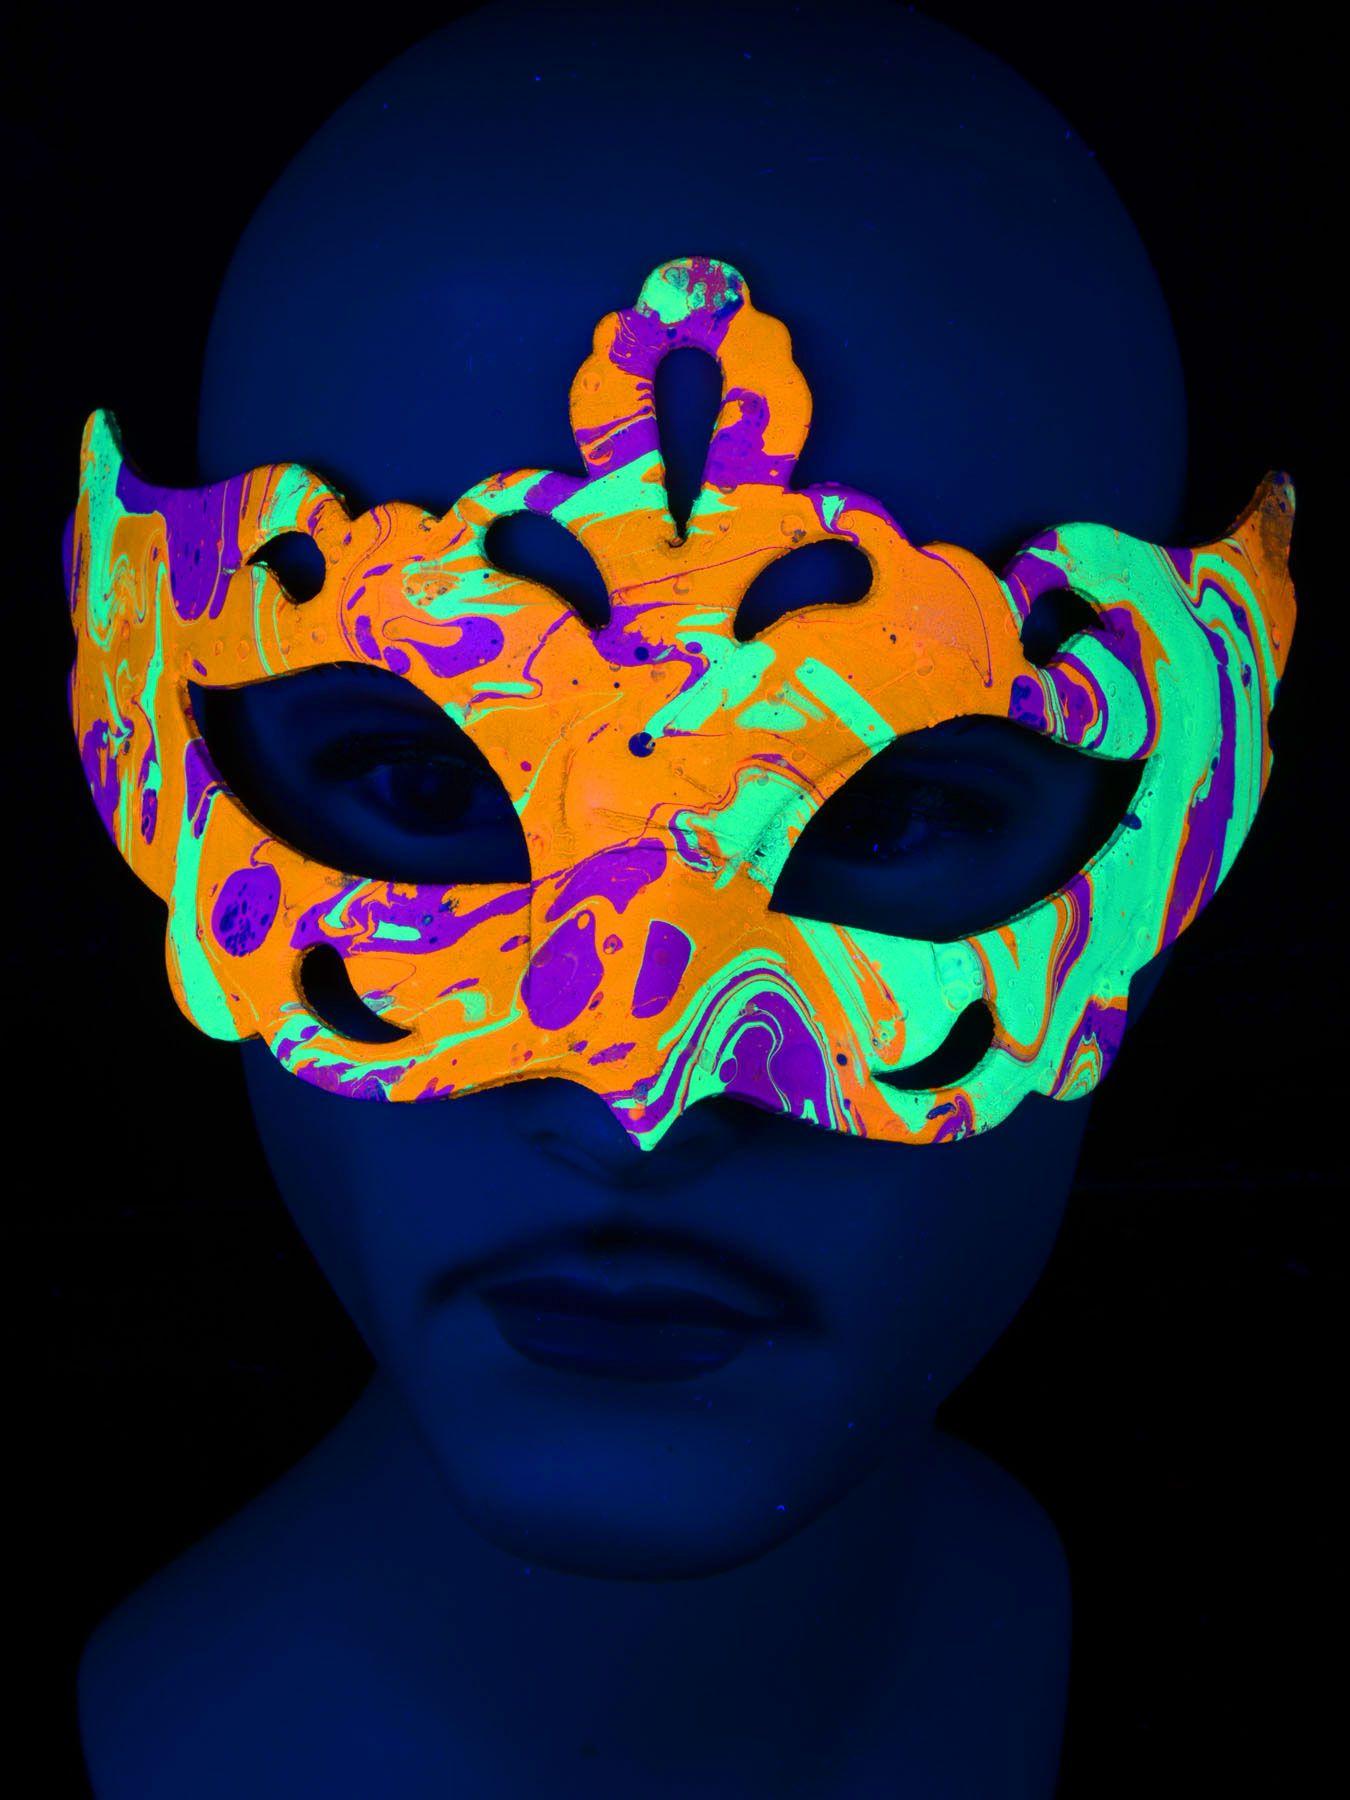 "Schwarzlicht Psywork Maske Colombina Murano ""Multicolor Princess"" #blacklight #schwarzlicht #psy #neon #party #karnevall #fasching #mask #magic #marble #halloween"